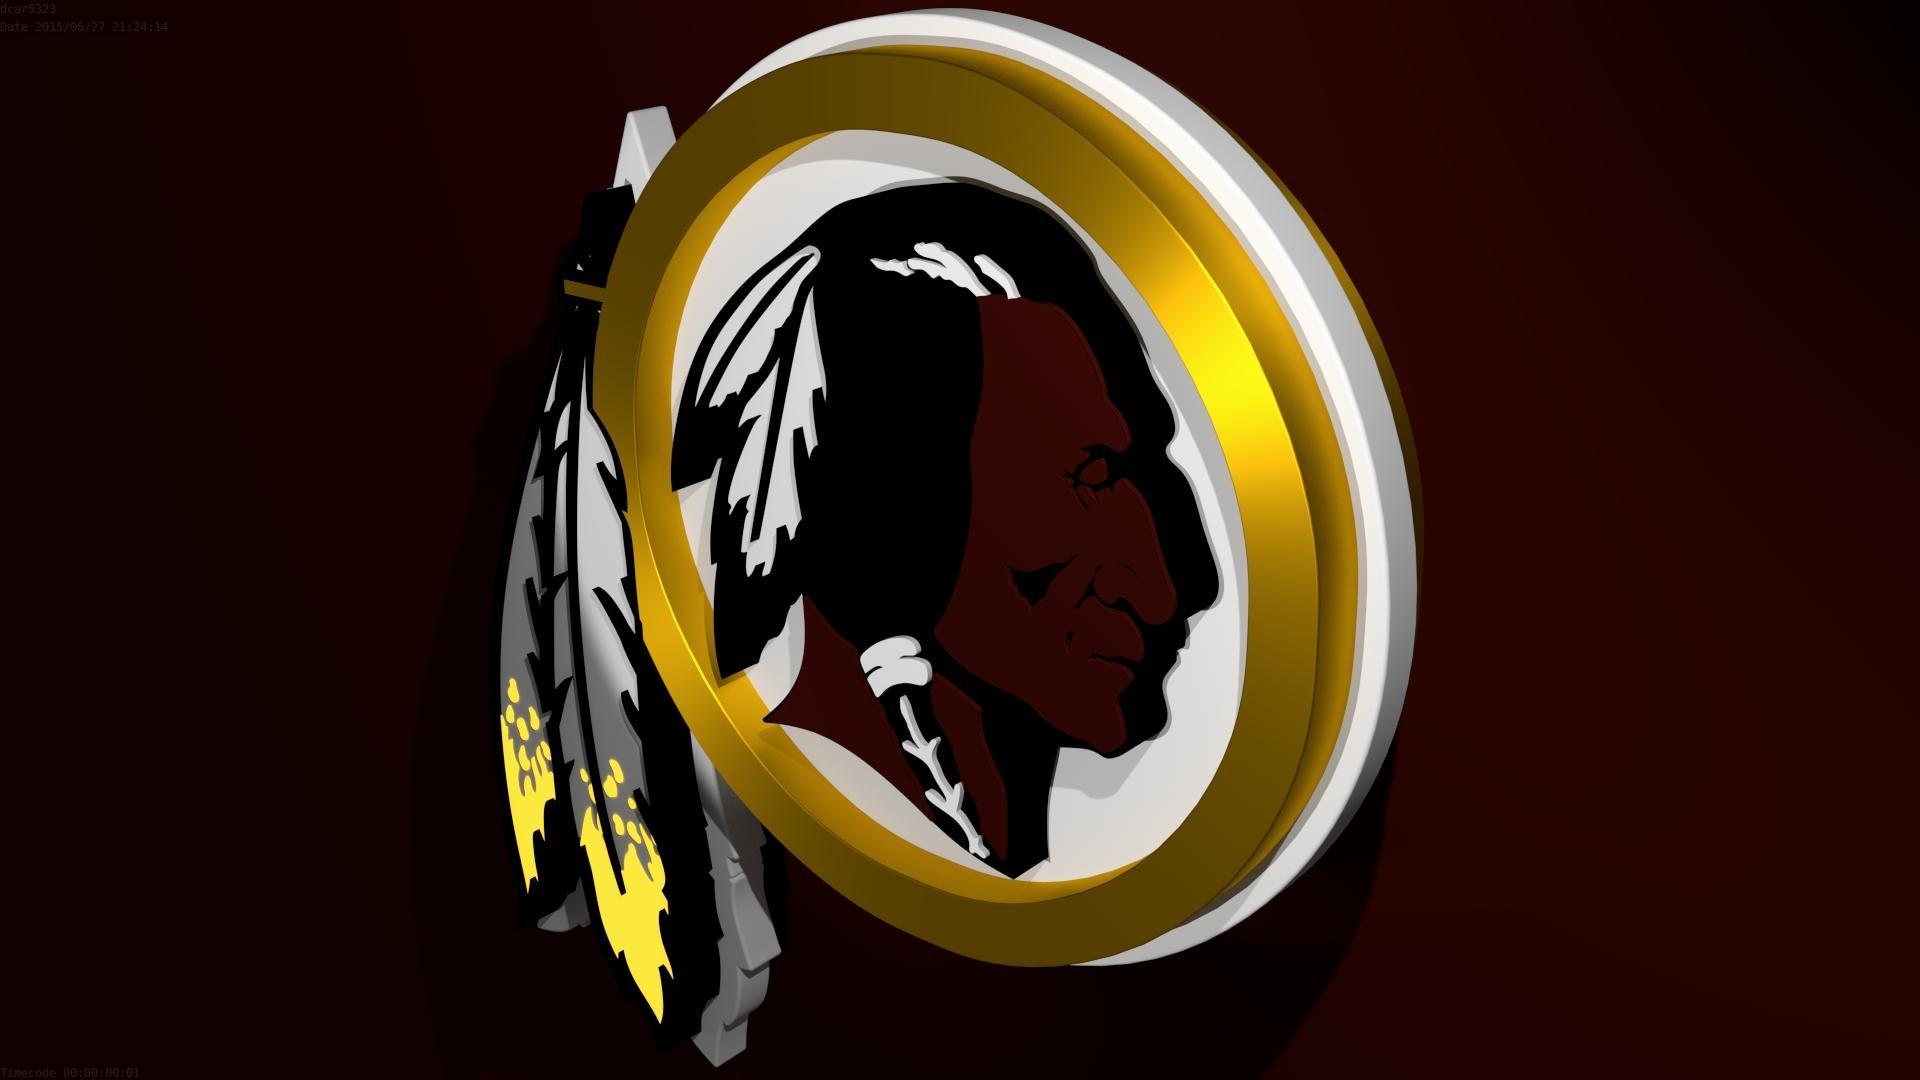 Washington Redskins. 7 mins ago Football